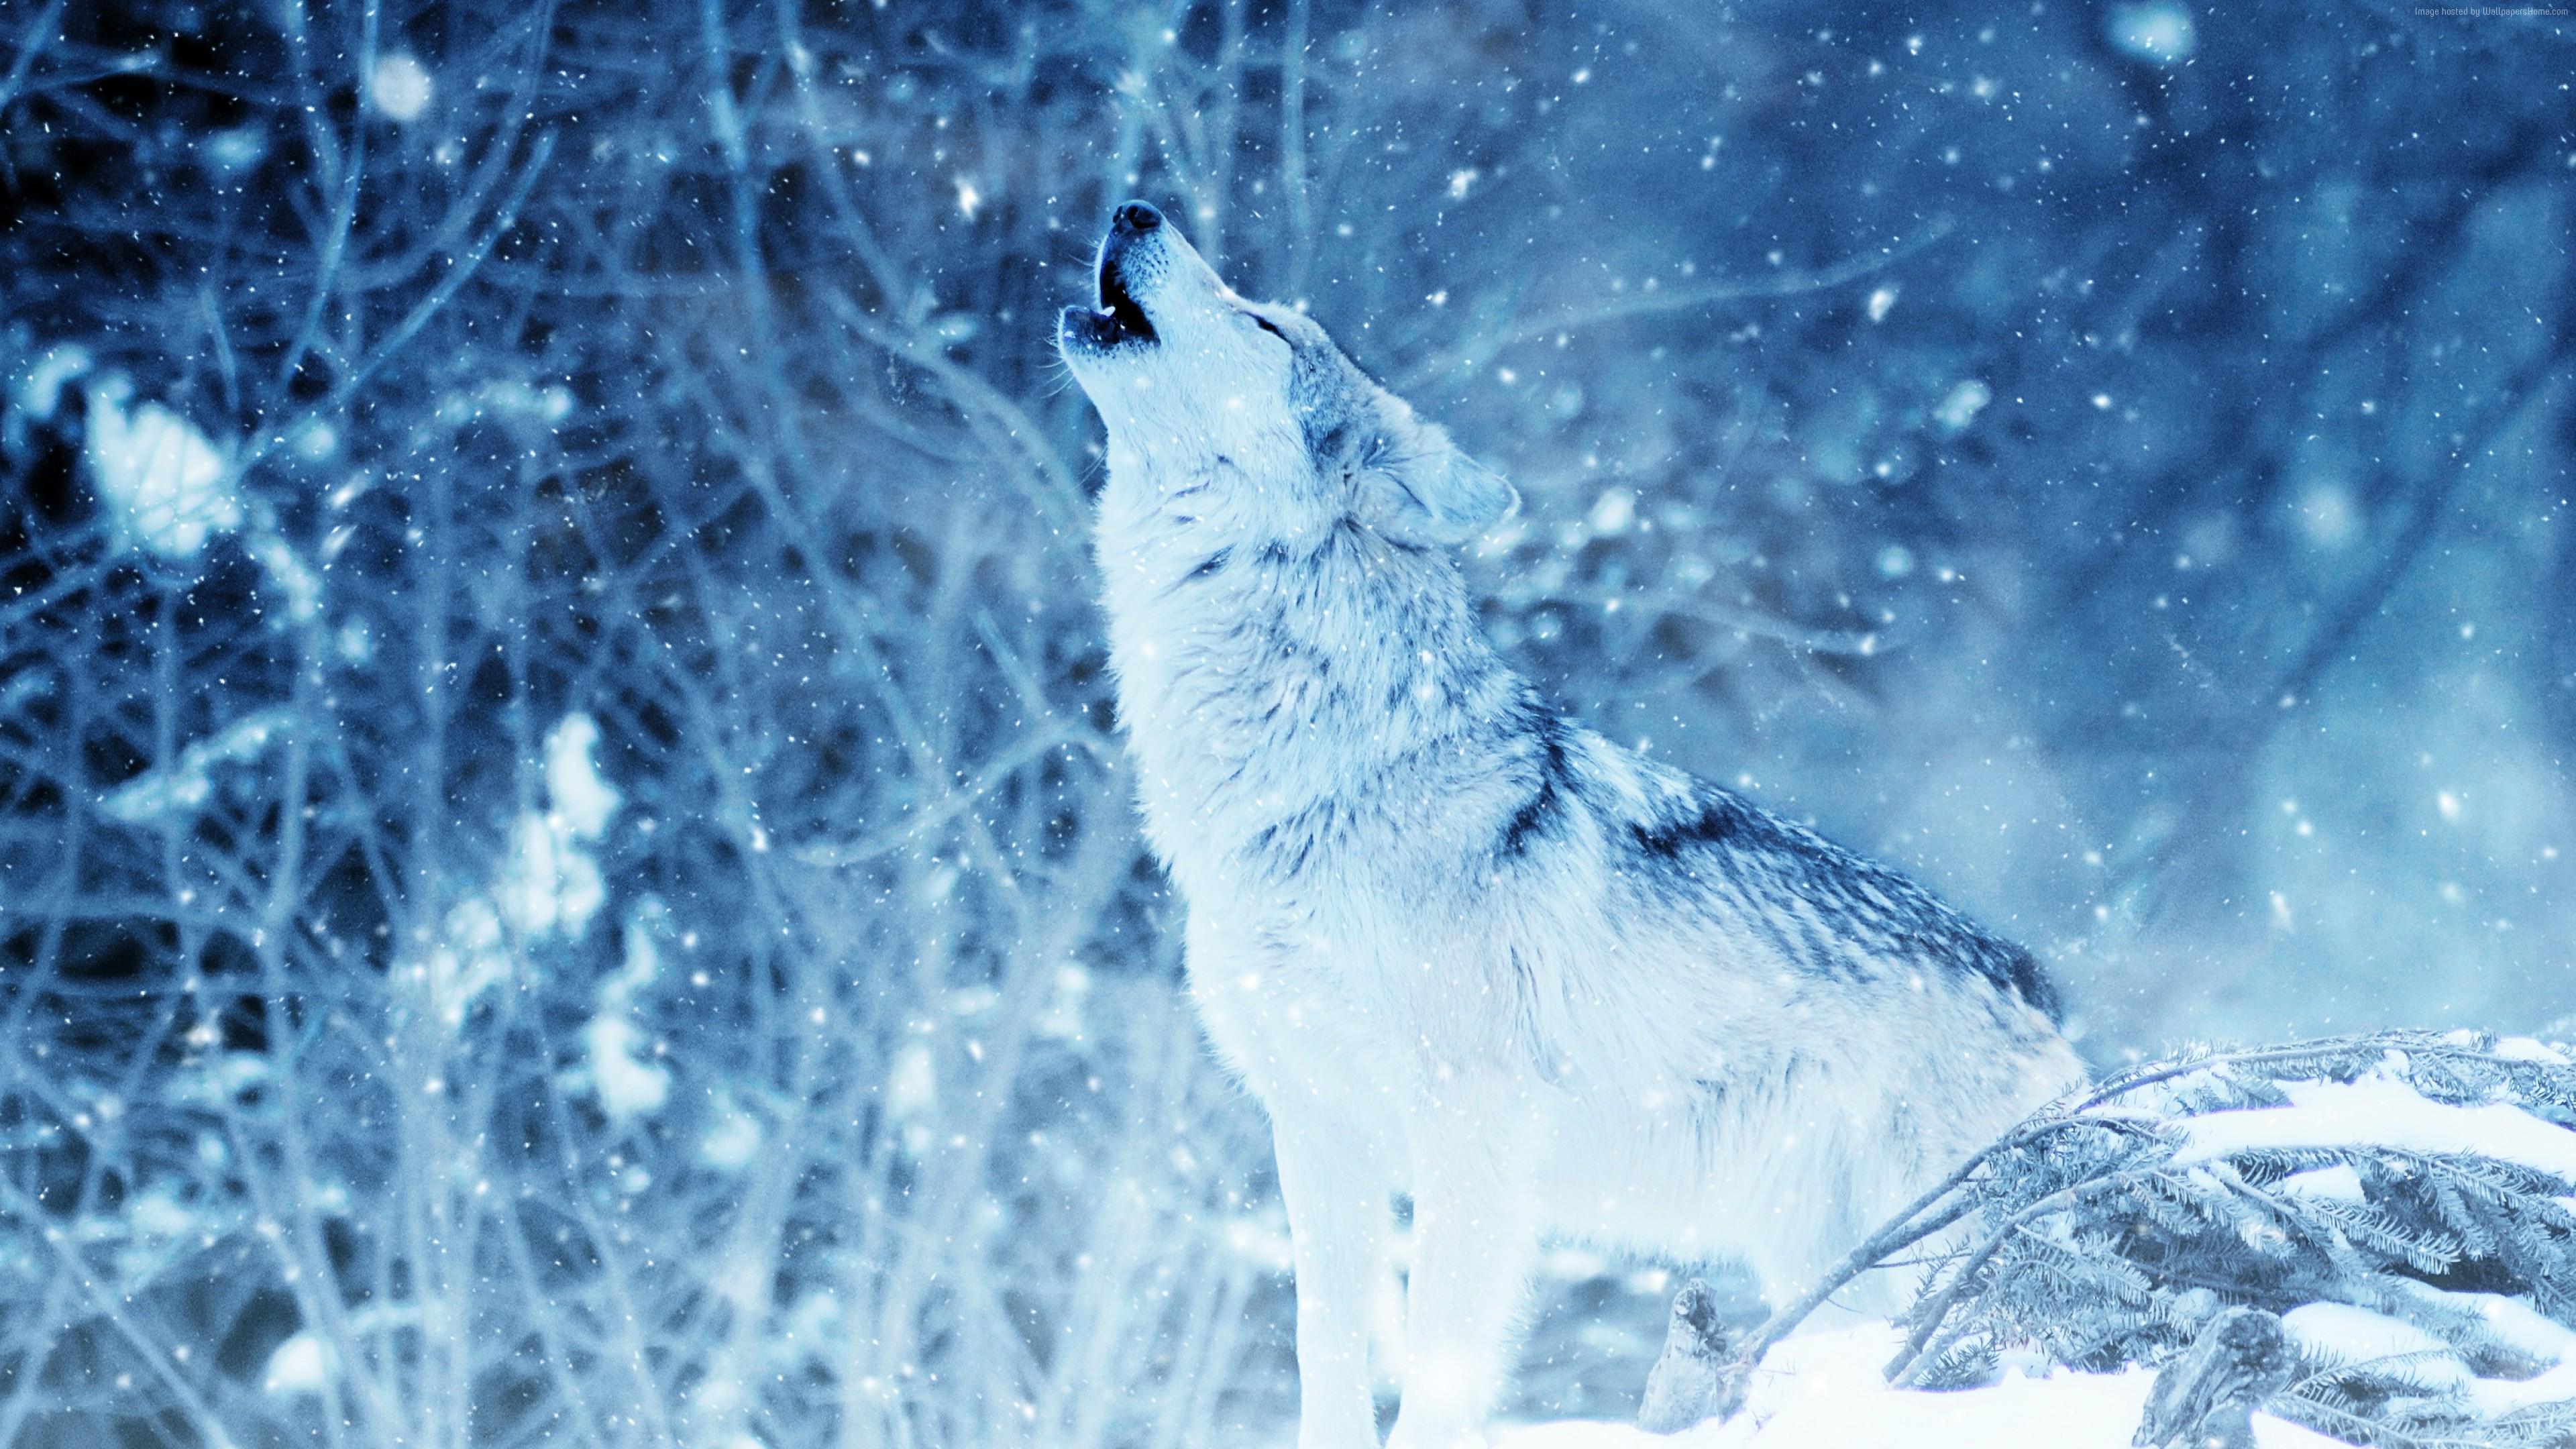 Wallpaper Wolf Winter Snow 4k Animals Wallpaper Download High Resolution 4k Wallpaper